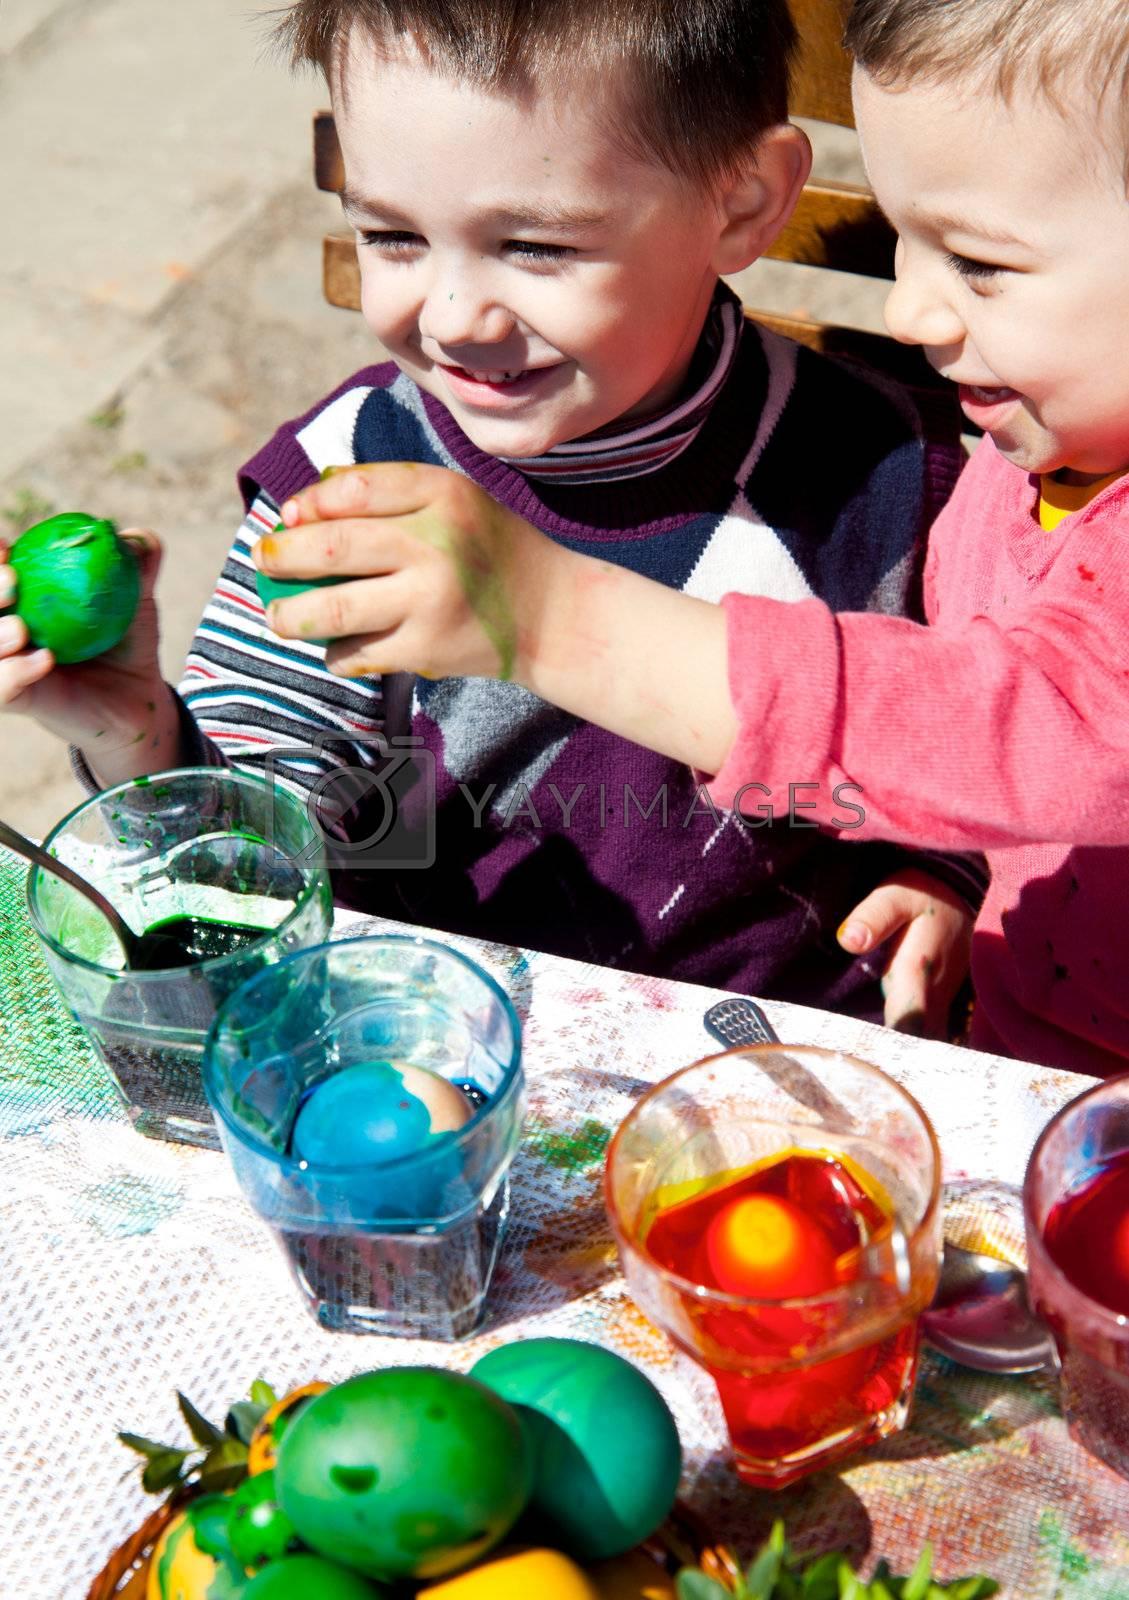 boys fighting easter eggs by anton.chalakov@gmail.com